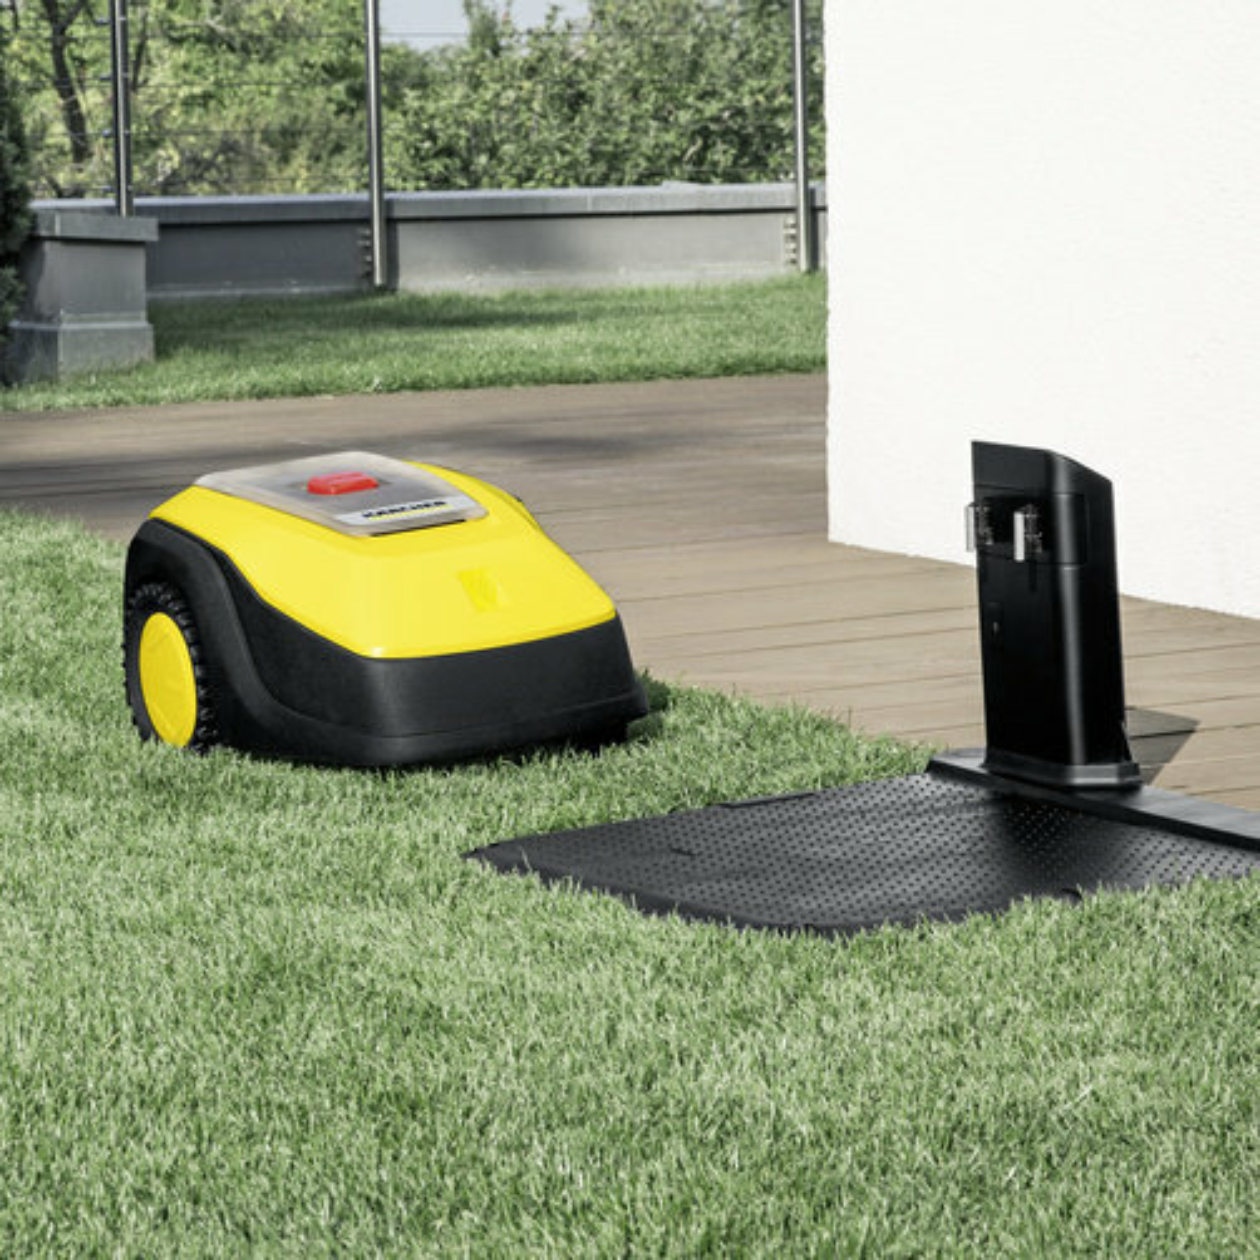 RLM 4 charging station app 1 CI15502x502 - Robot cortacésped  KARCHER RLM 4.           1.445-000.0